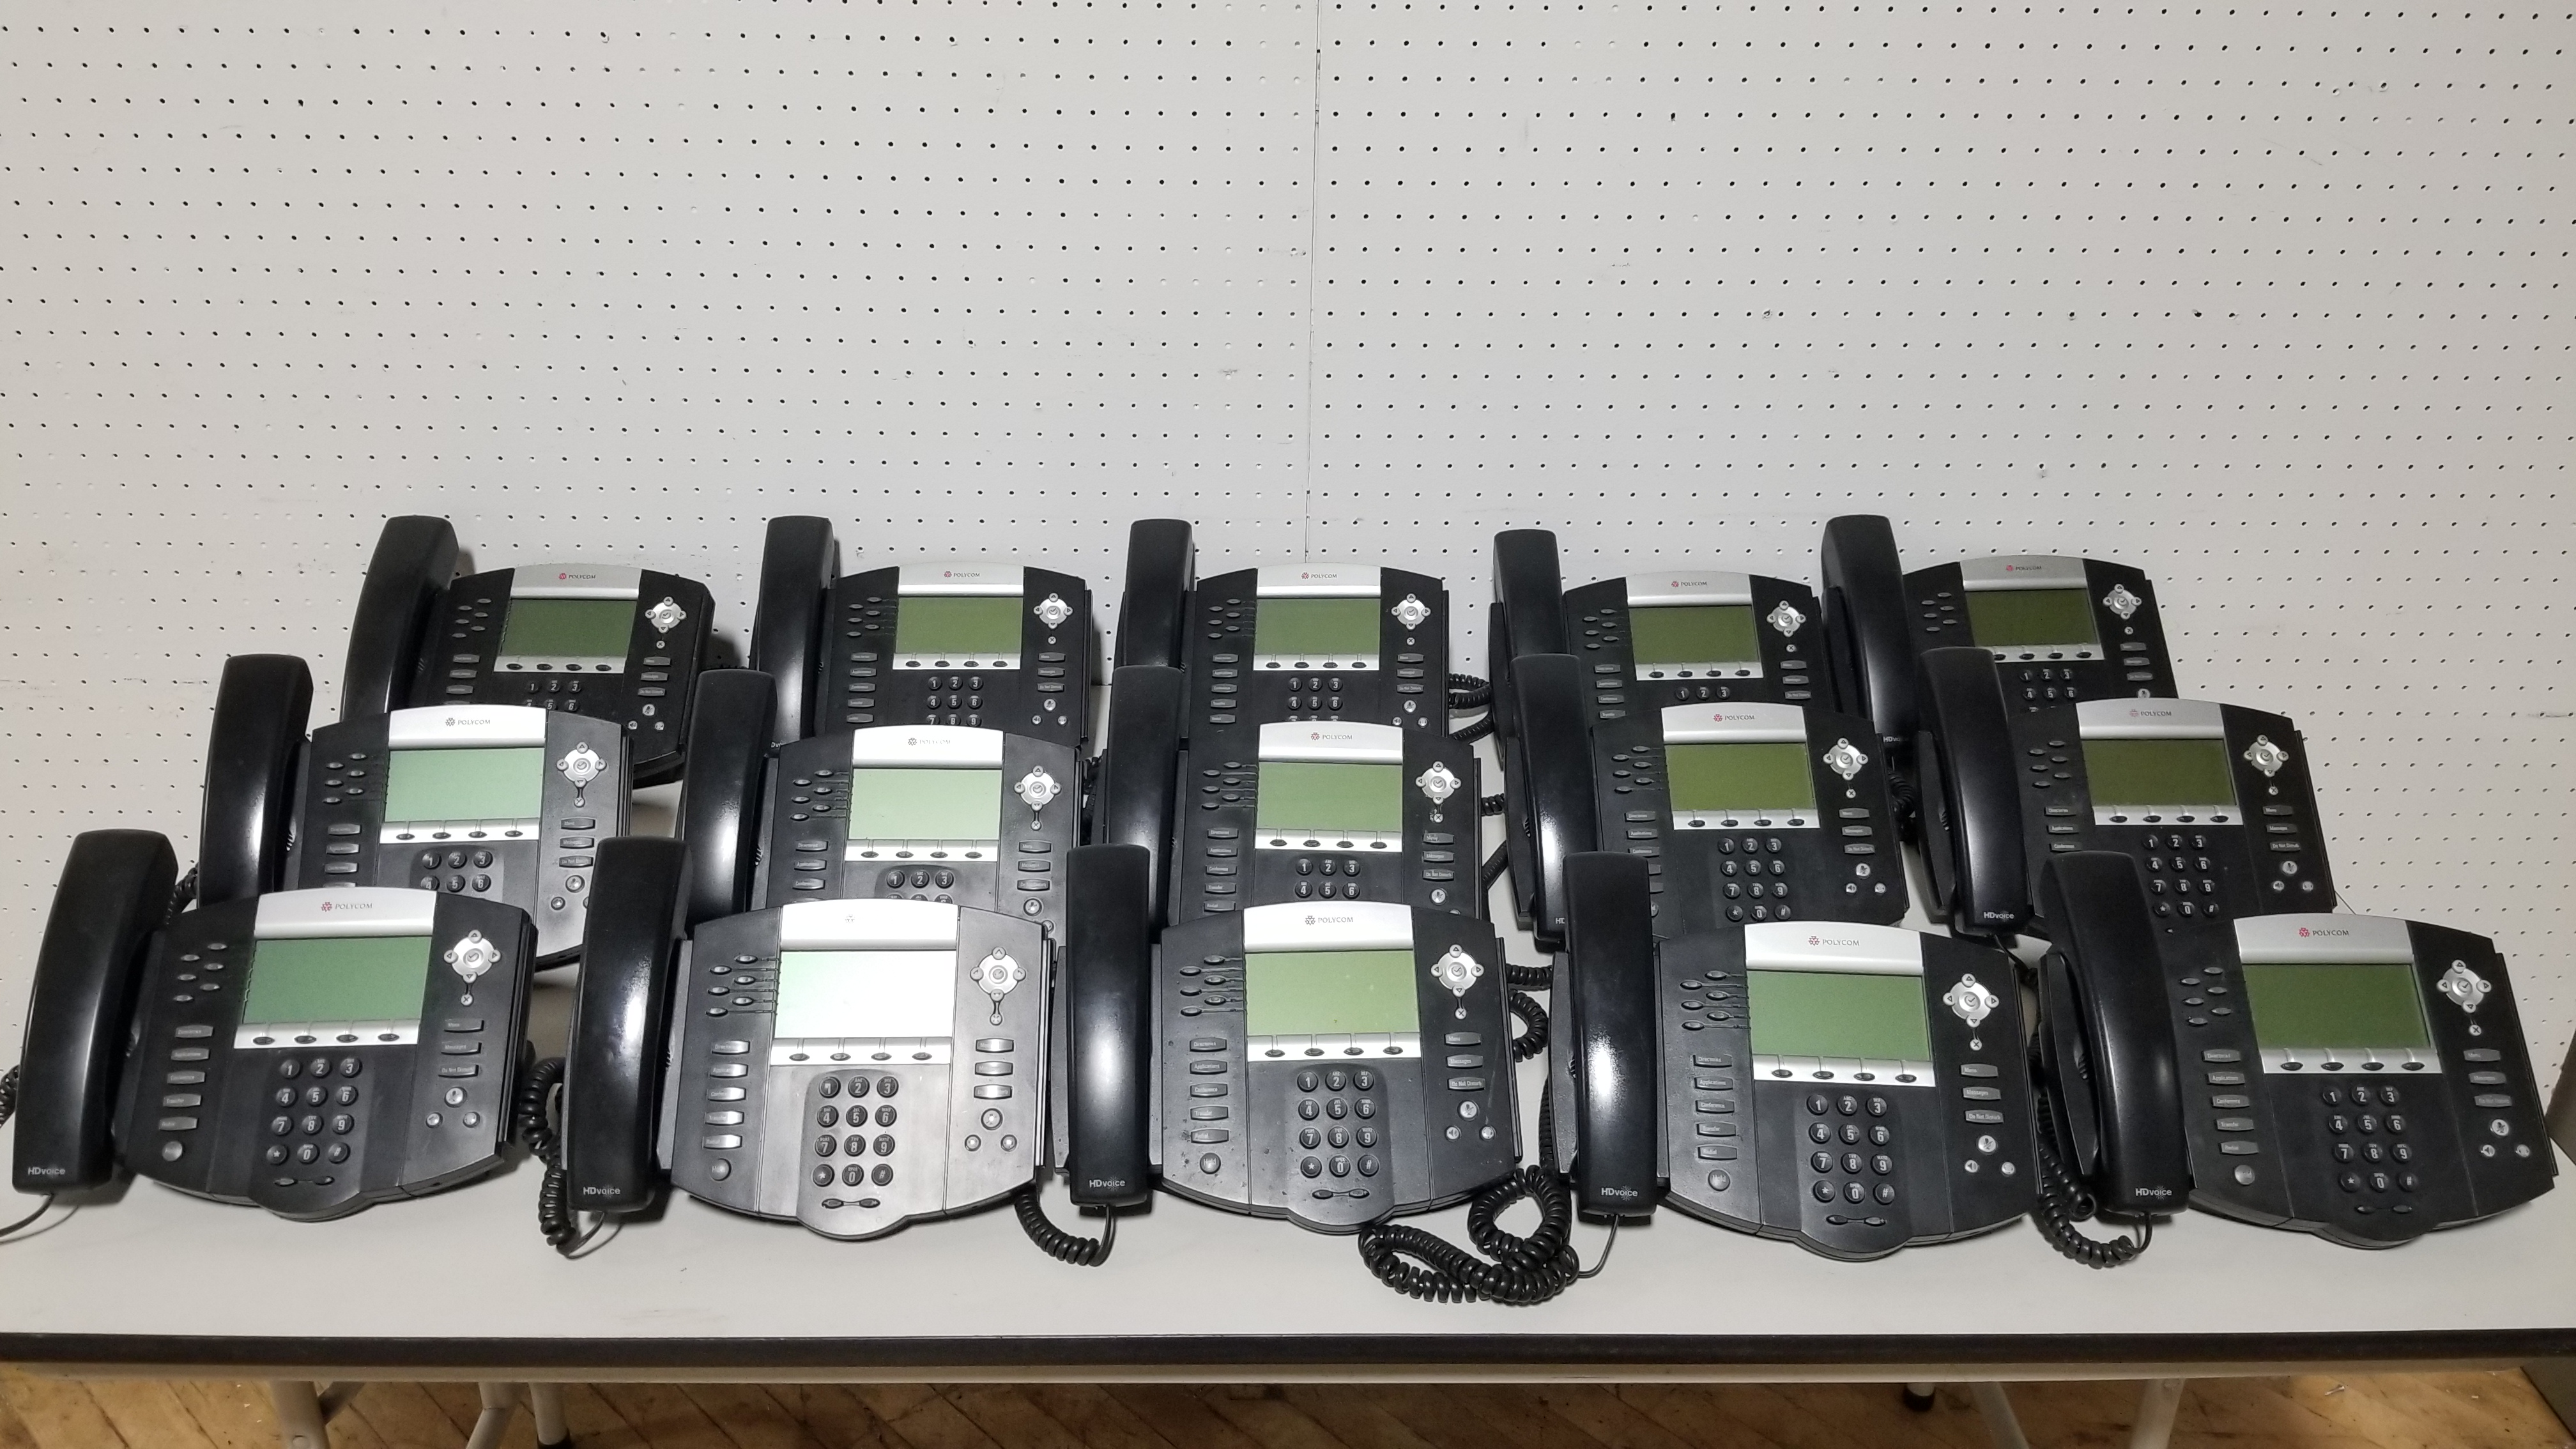 #121. 15 POLYCOM PHONES